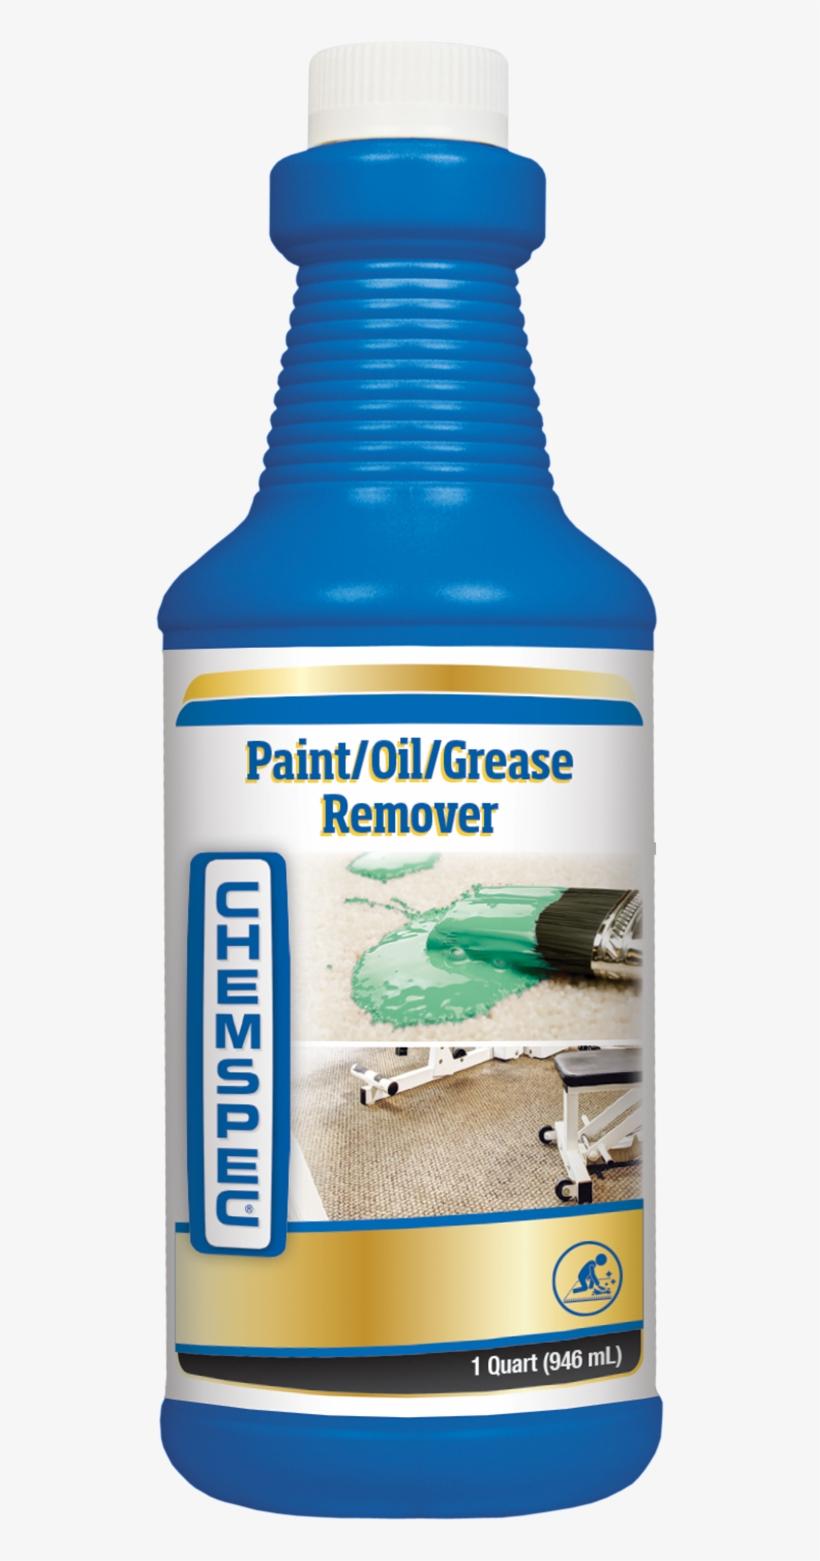 Chemspec Chemspec Paint Oil Grease Remover P.o.g. Quart, transparent png #5276184